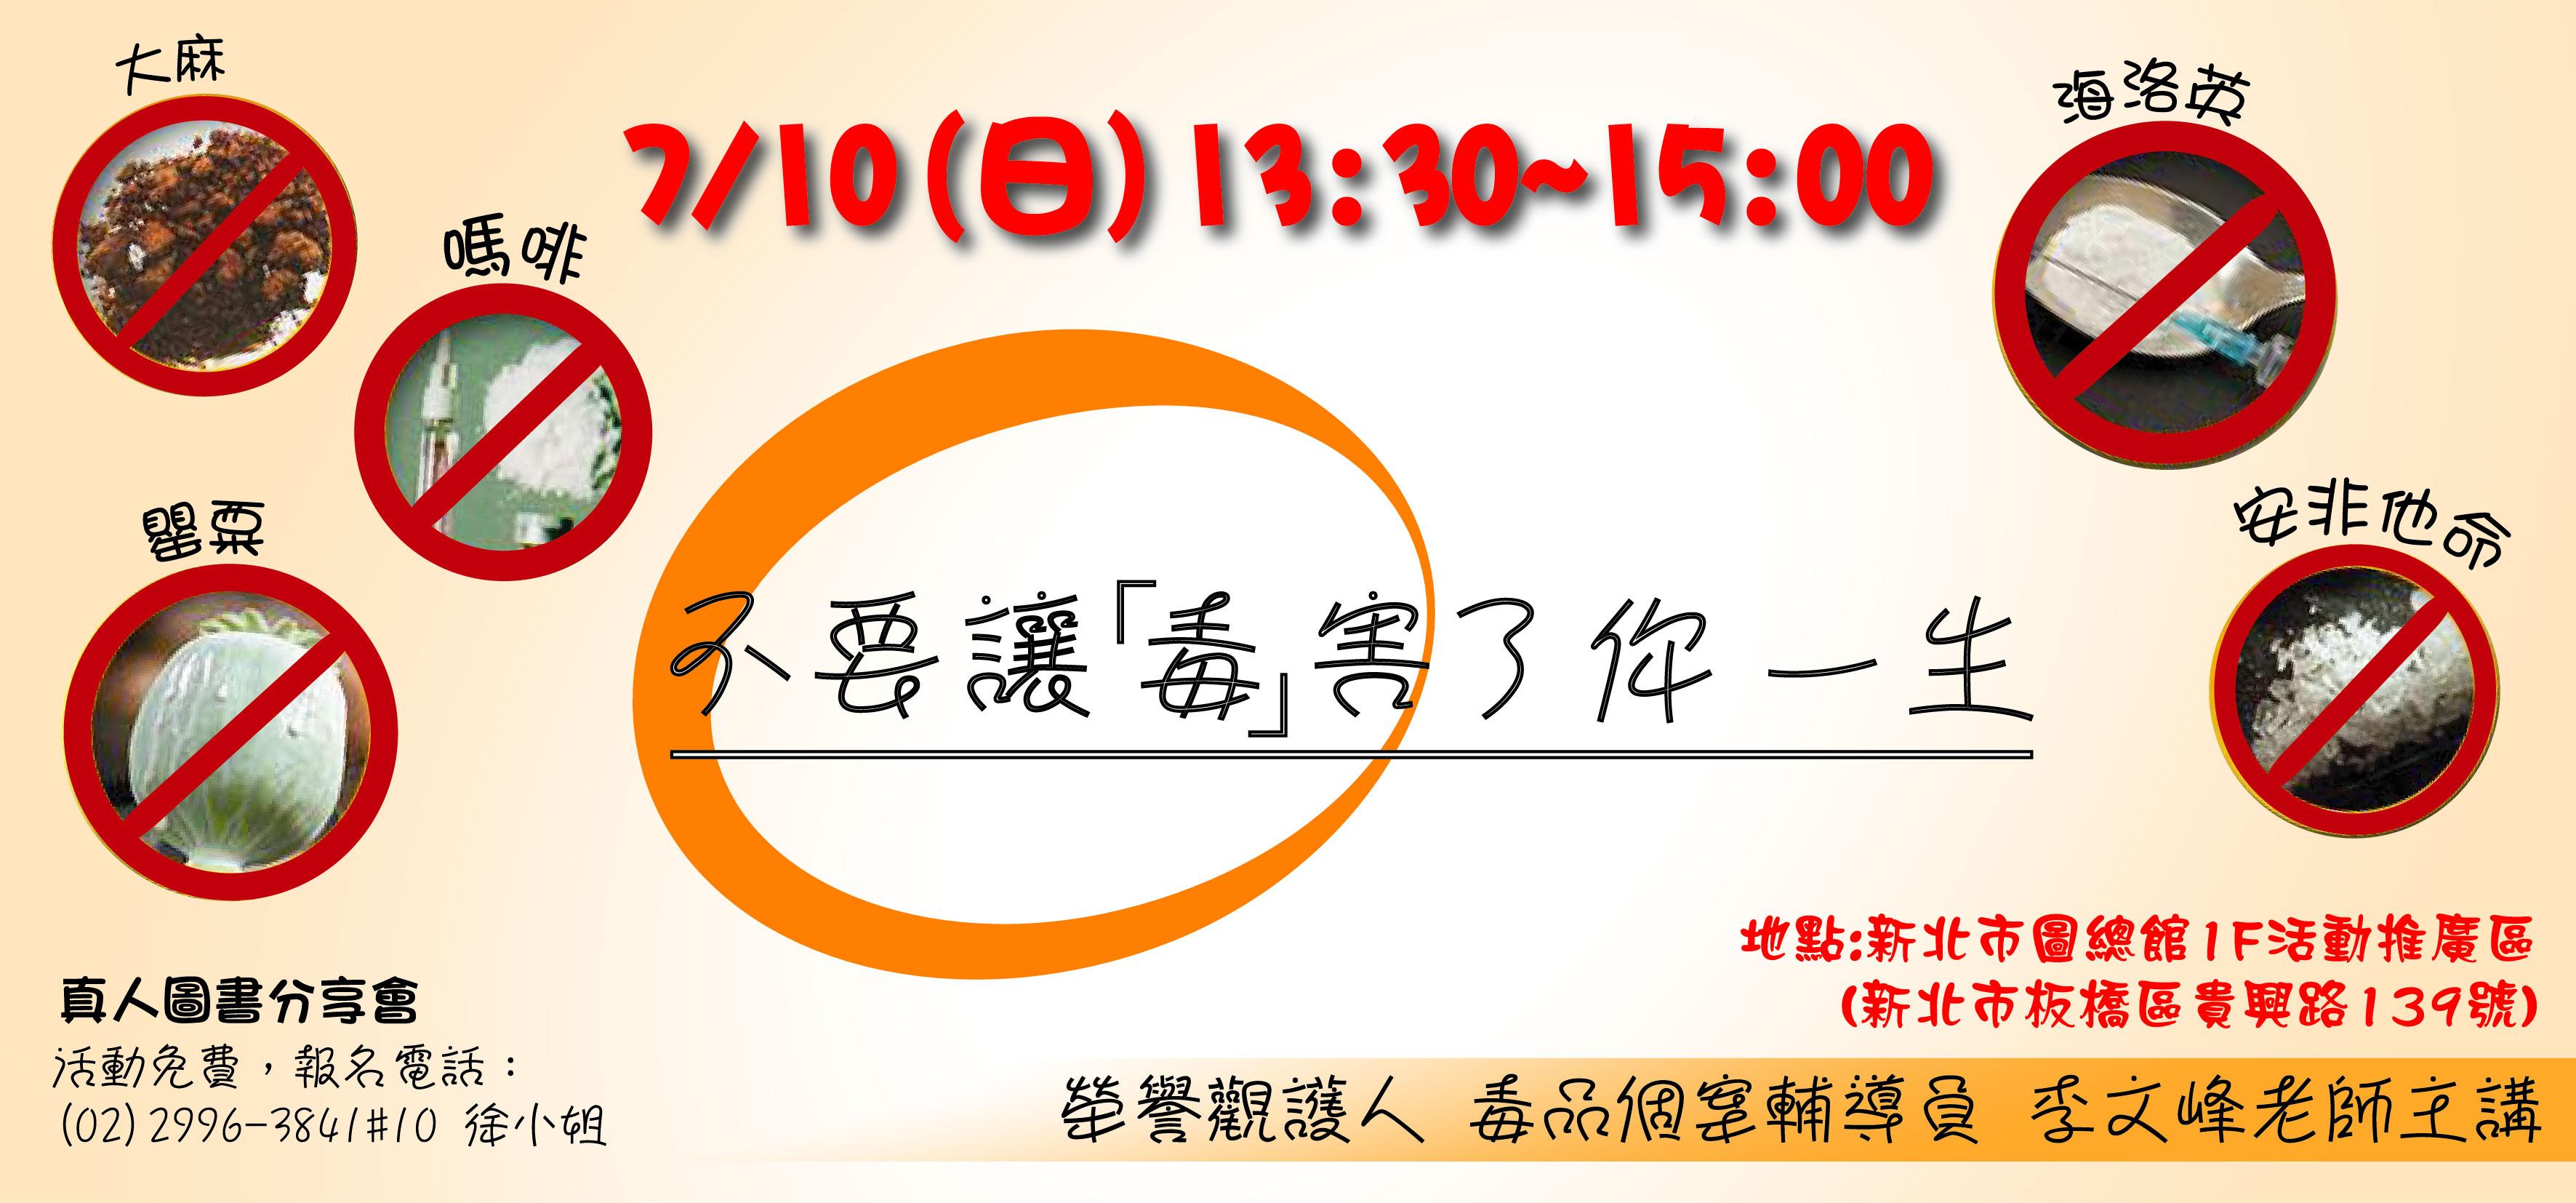 7/10 真人